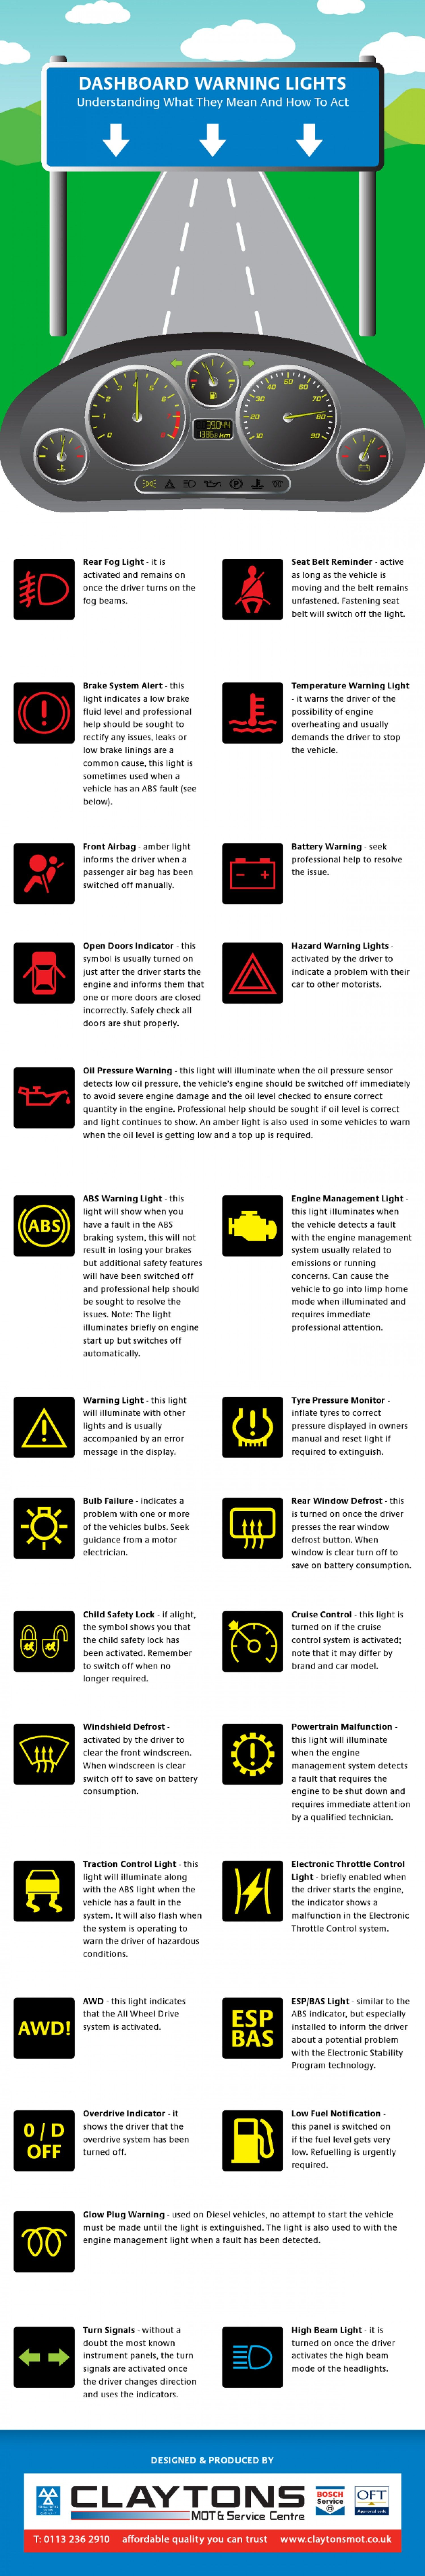 Hyundai Dashboard Symbols And Meanings : hyundai, dashboard, symbols, meanings, Dashboard, Symbols, Meanings, Hyundai, Valentine, About